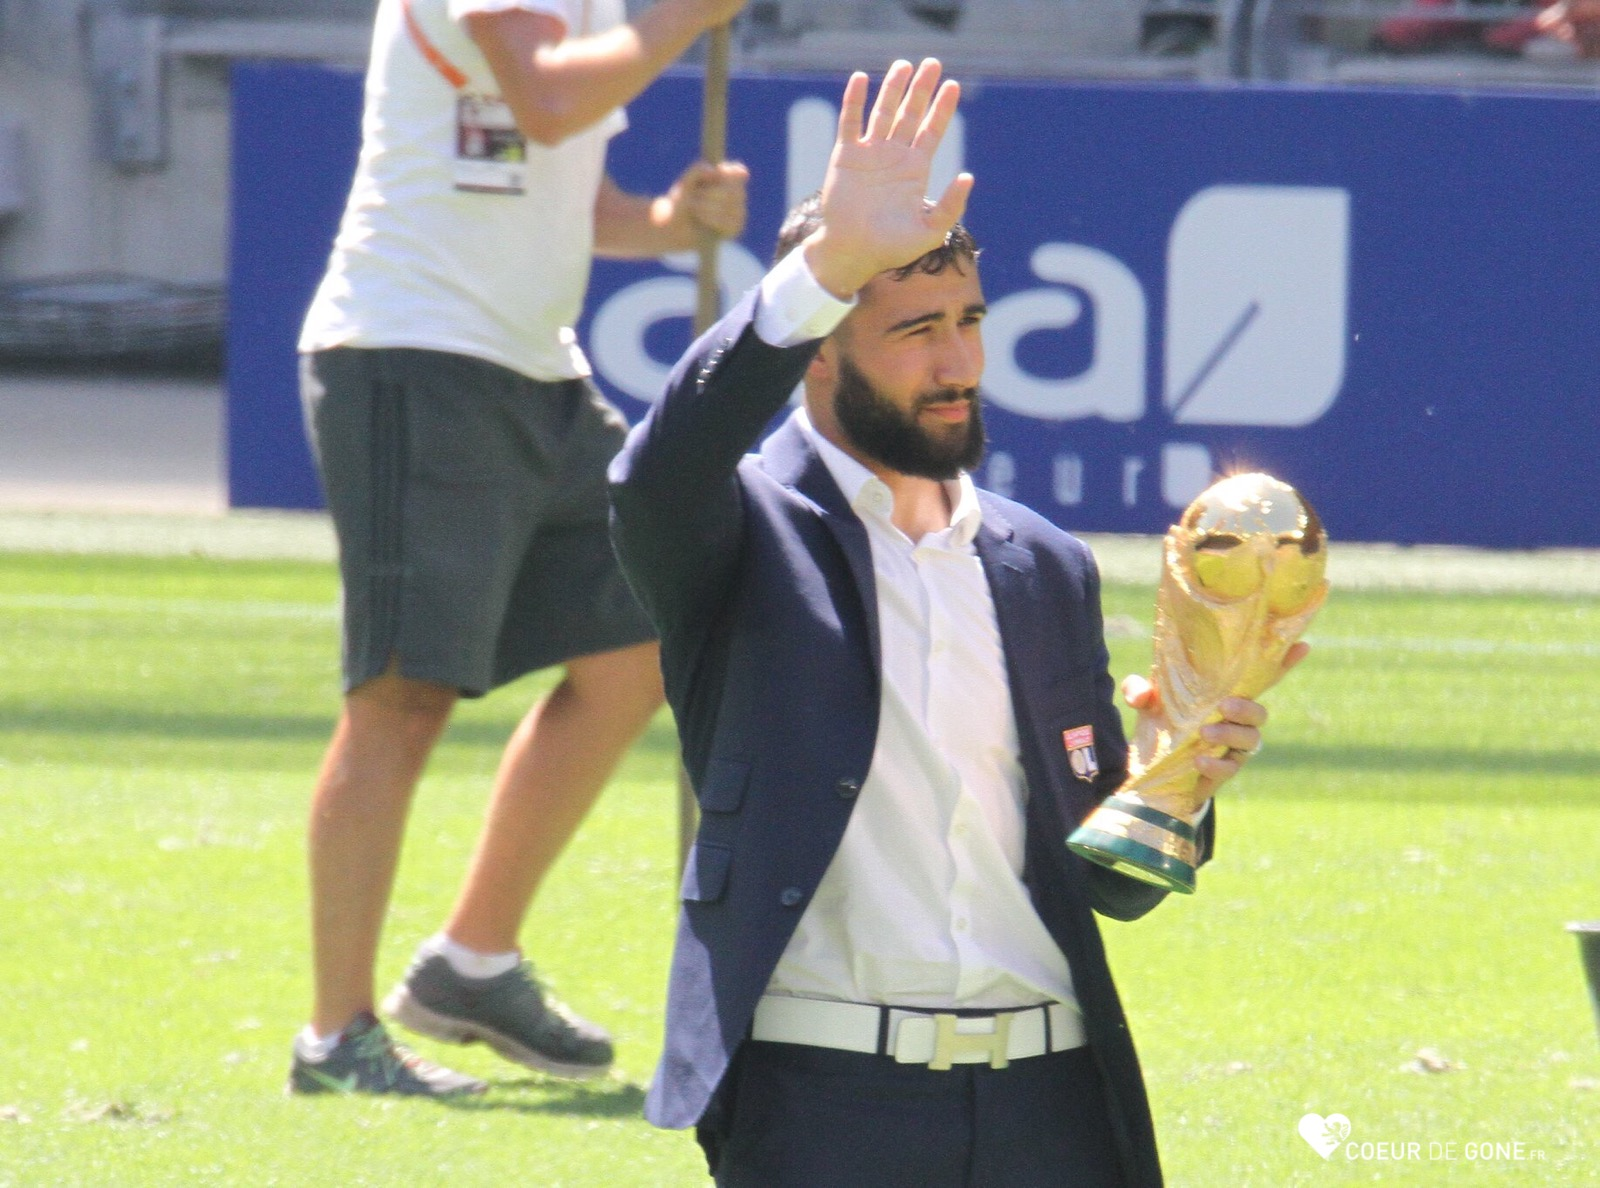 [Mercato] Nabil Fekir, le départ forcé